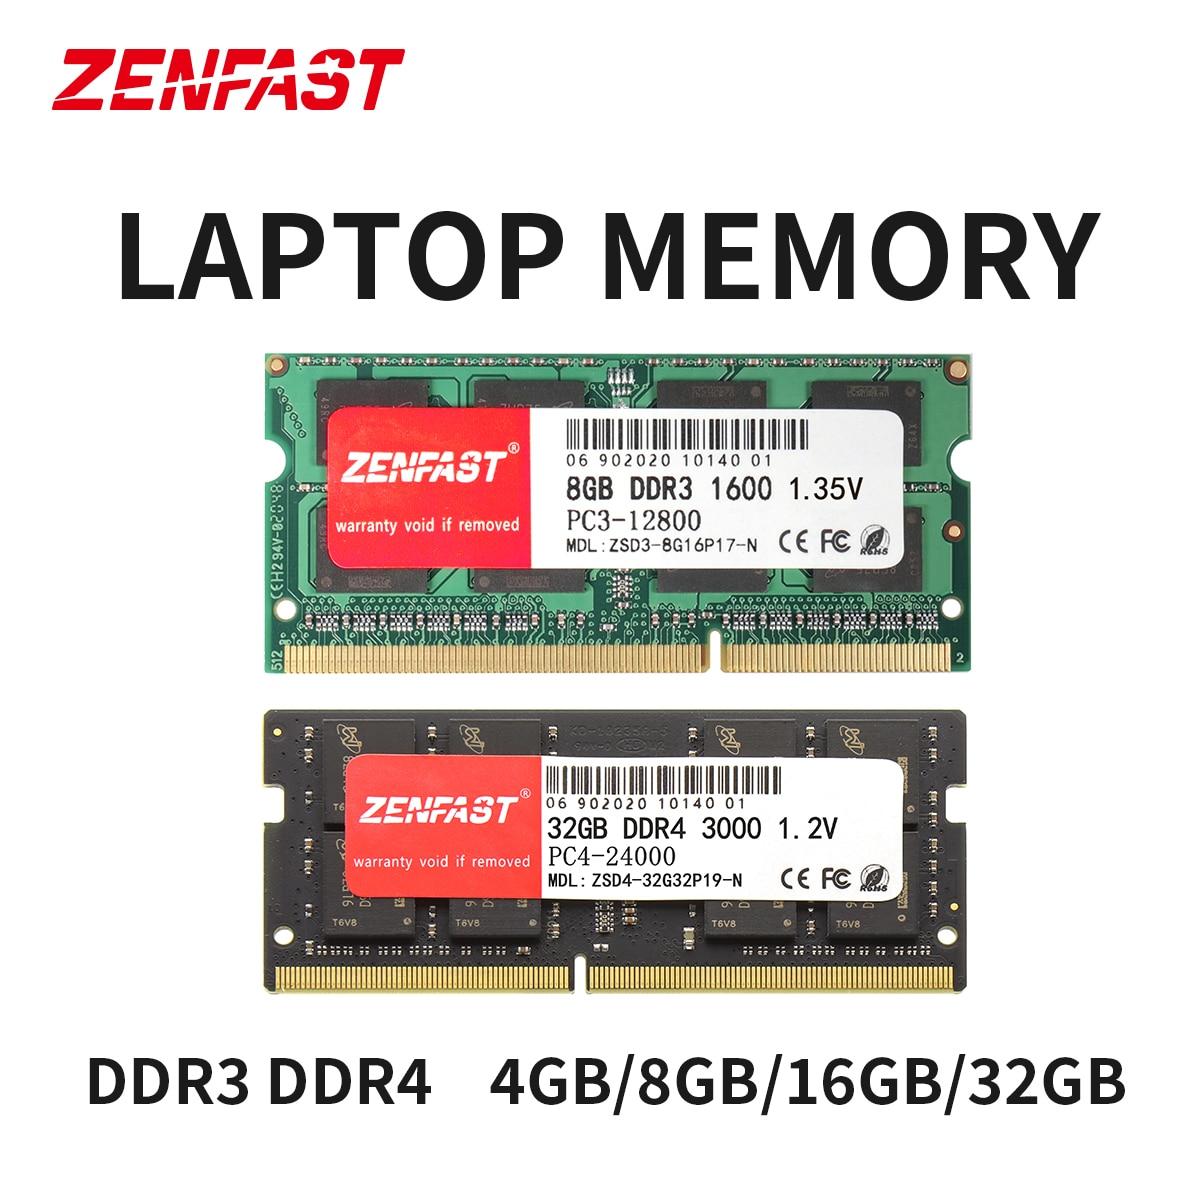 ZENFAST DDR3 DDR4 8GB 4GB 16GB Laptop Ram 1333 1600 2133 2400 2666MHz  240pin Sodimm Notebook Memory 1